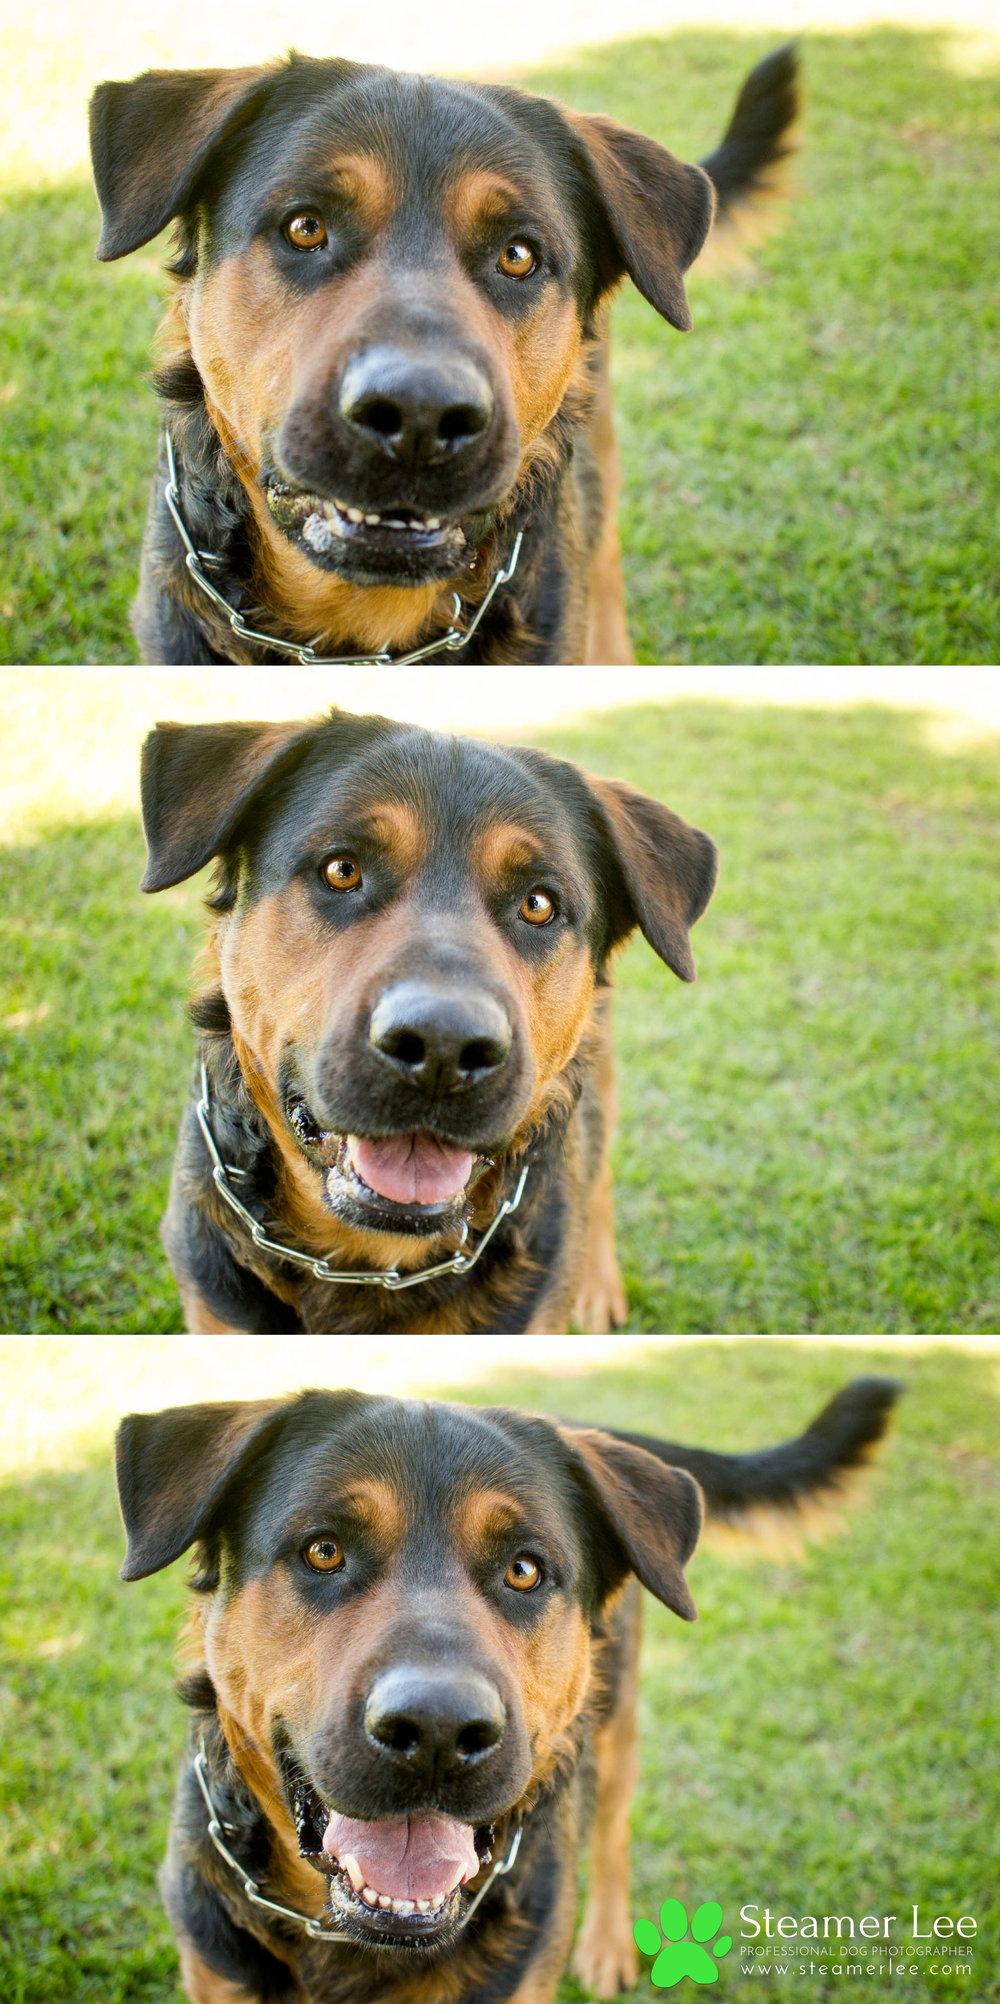 009 Steamer Lee Dog Photography - Orange County Dog Photography - German Shepherd Rottweiler Mix_Poodle.JPG